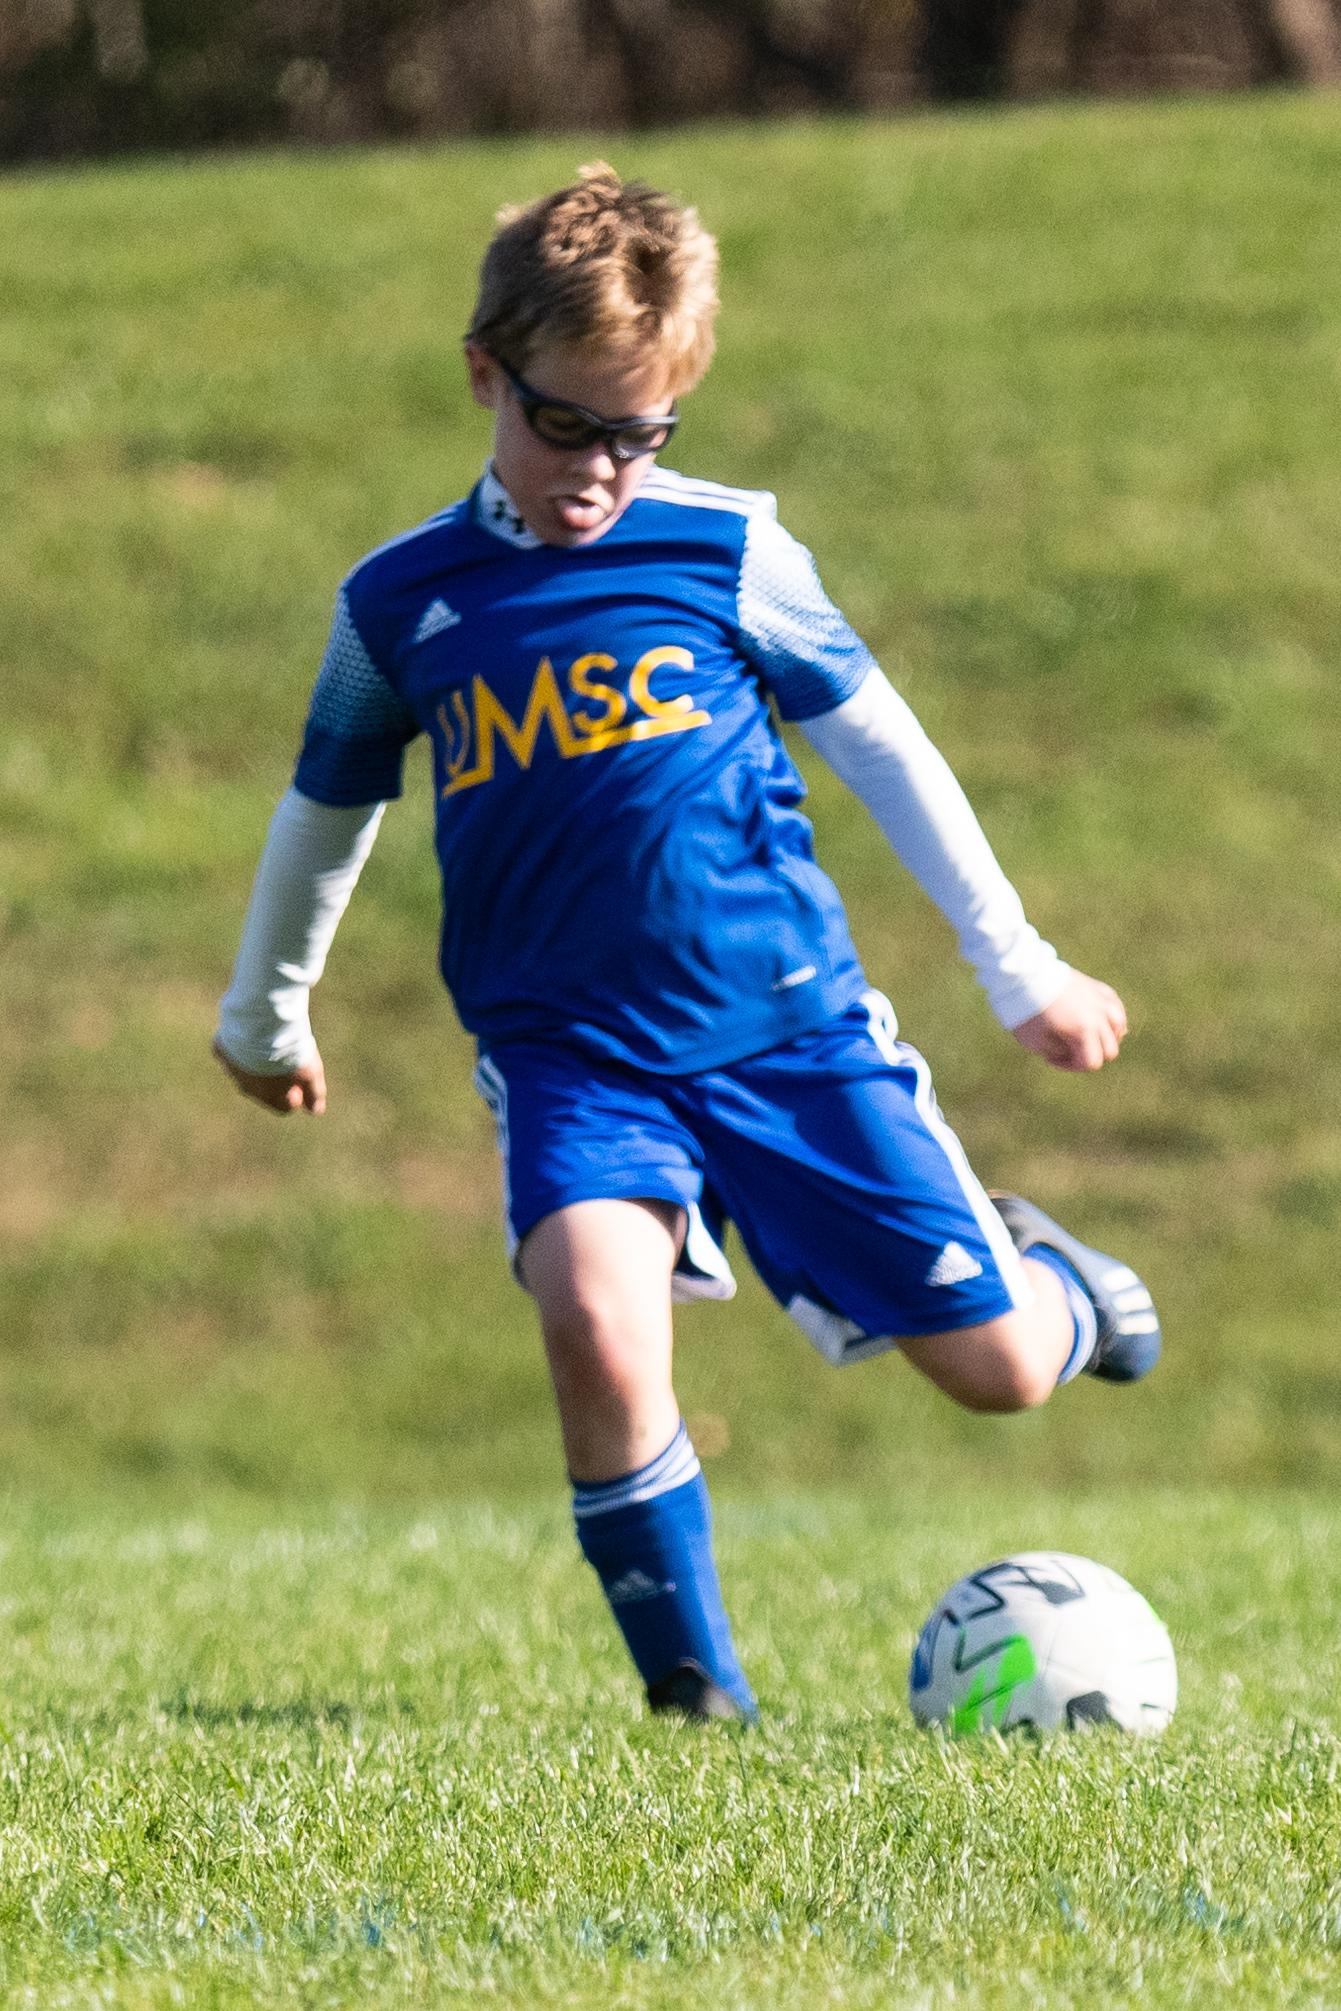 Boy shooting soccer ball